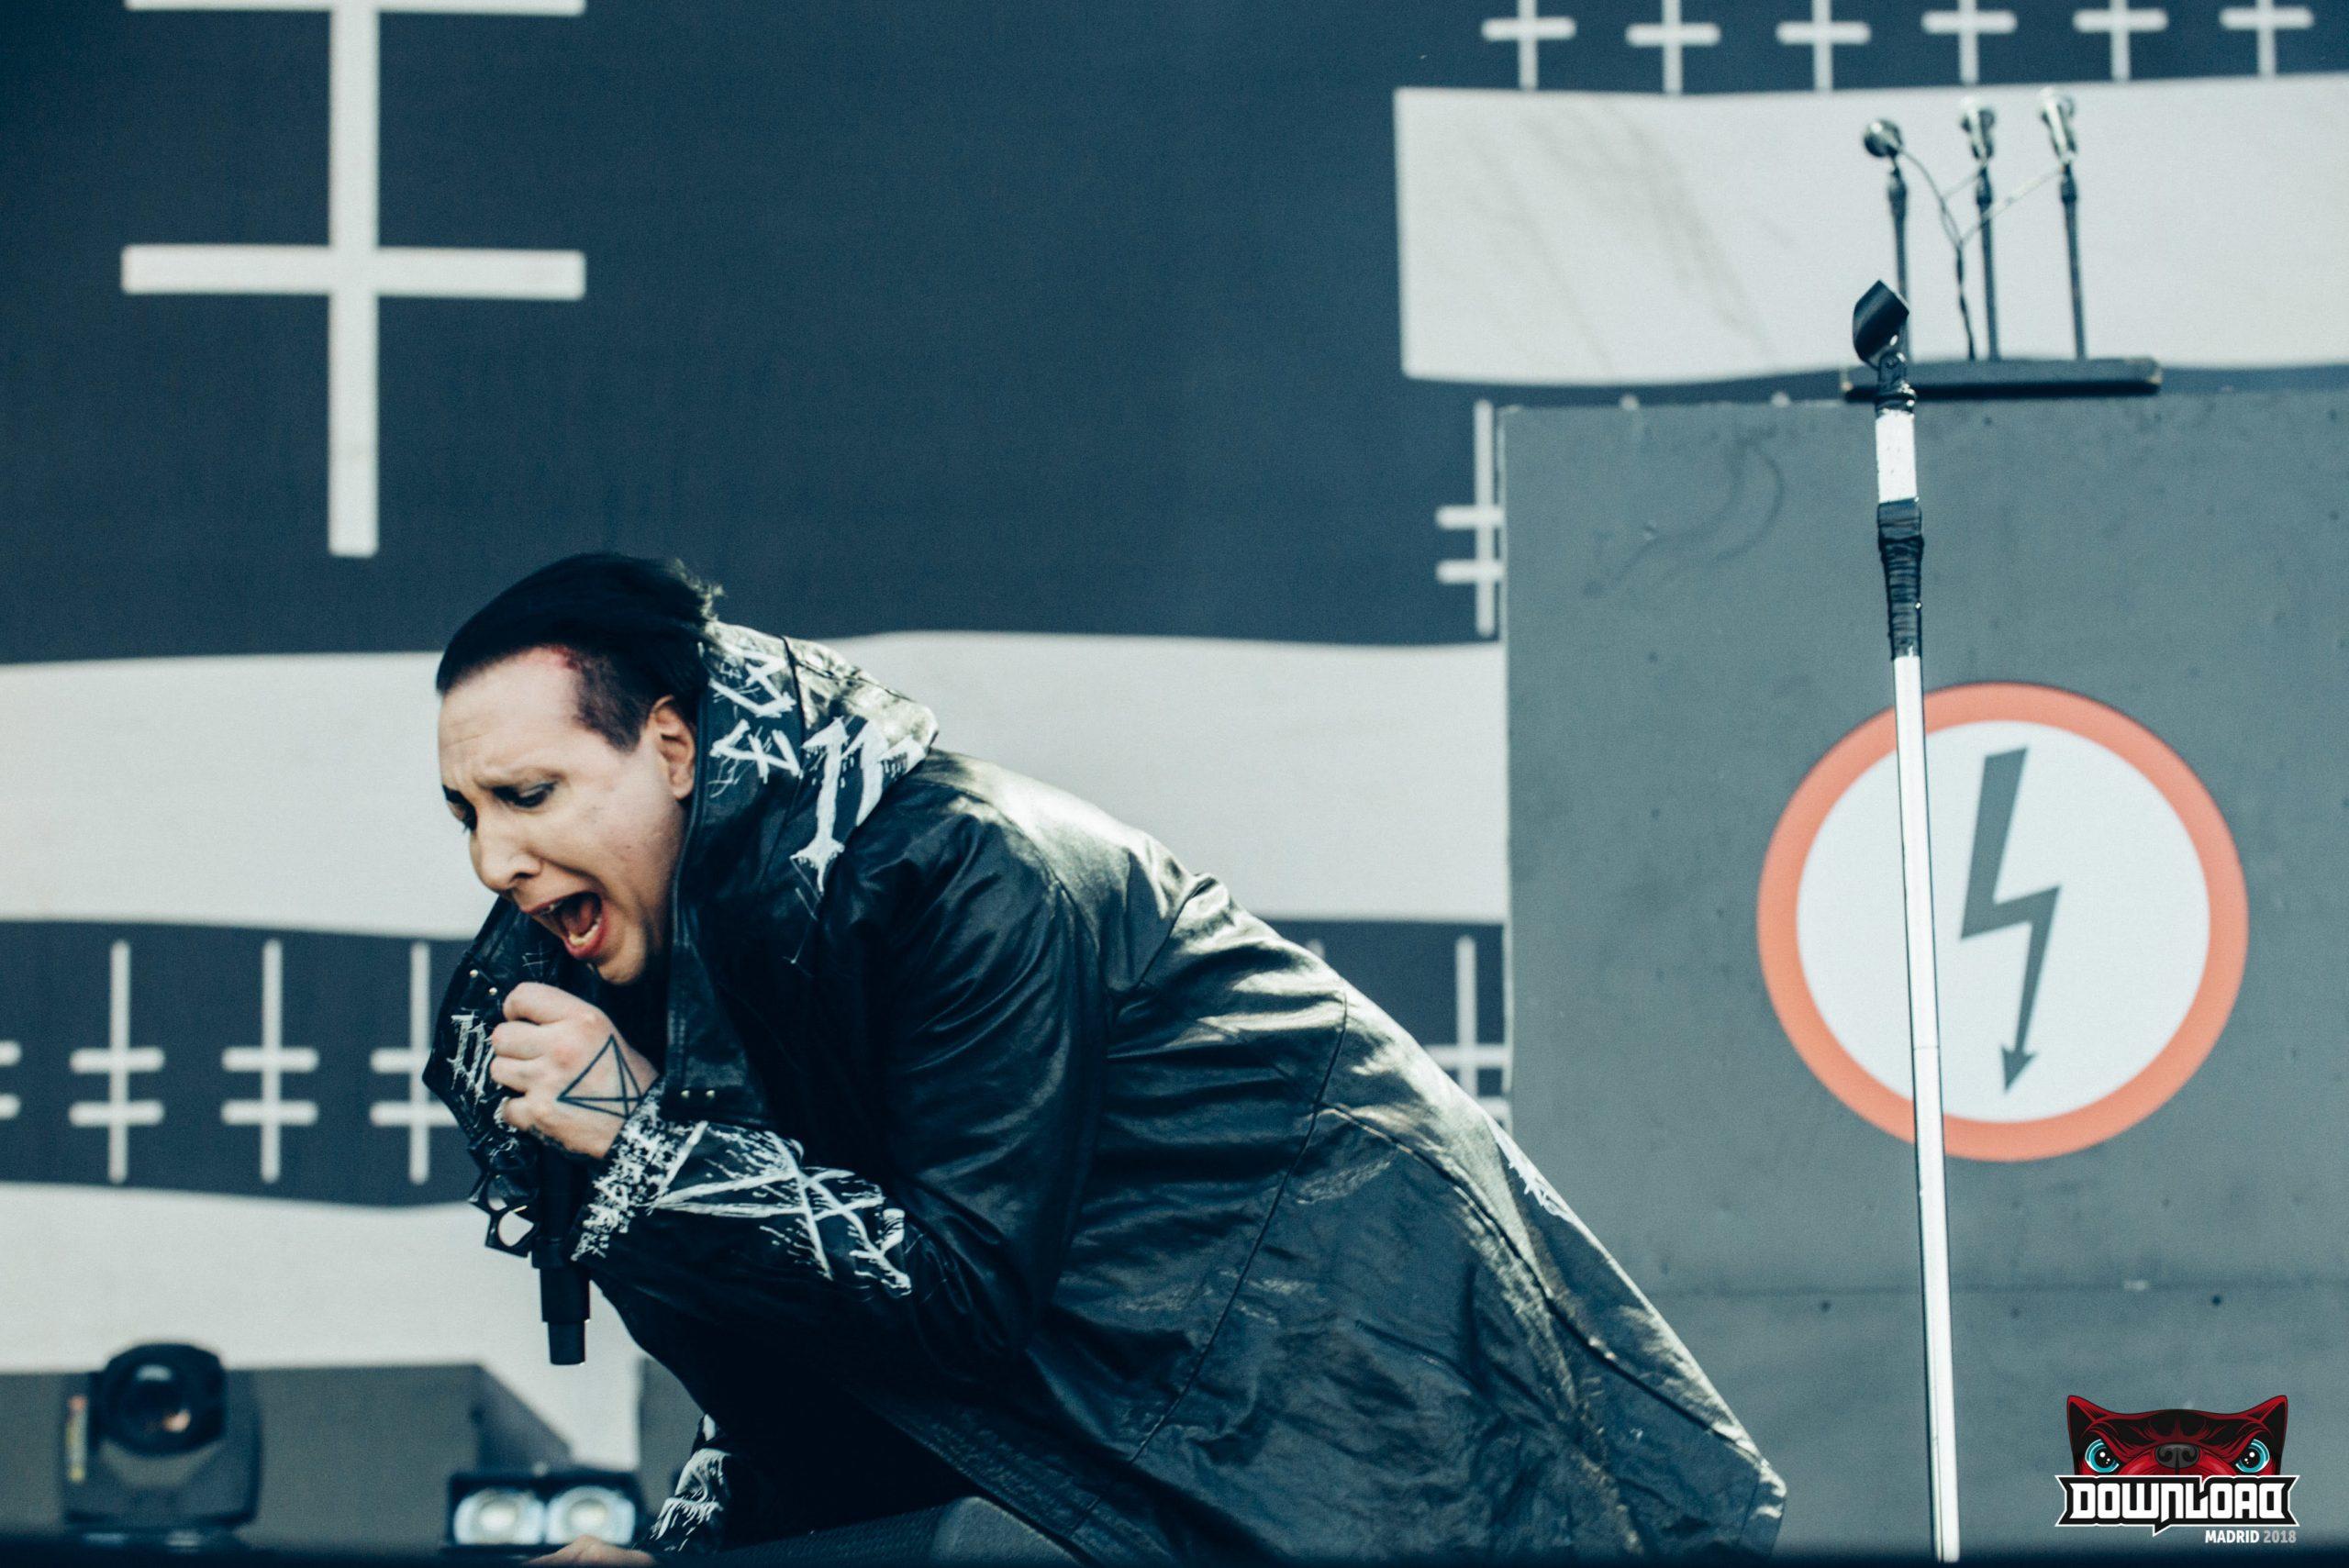 180628 Marilyn Manson - Download Festival Madrid 18